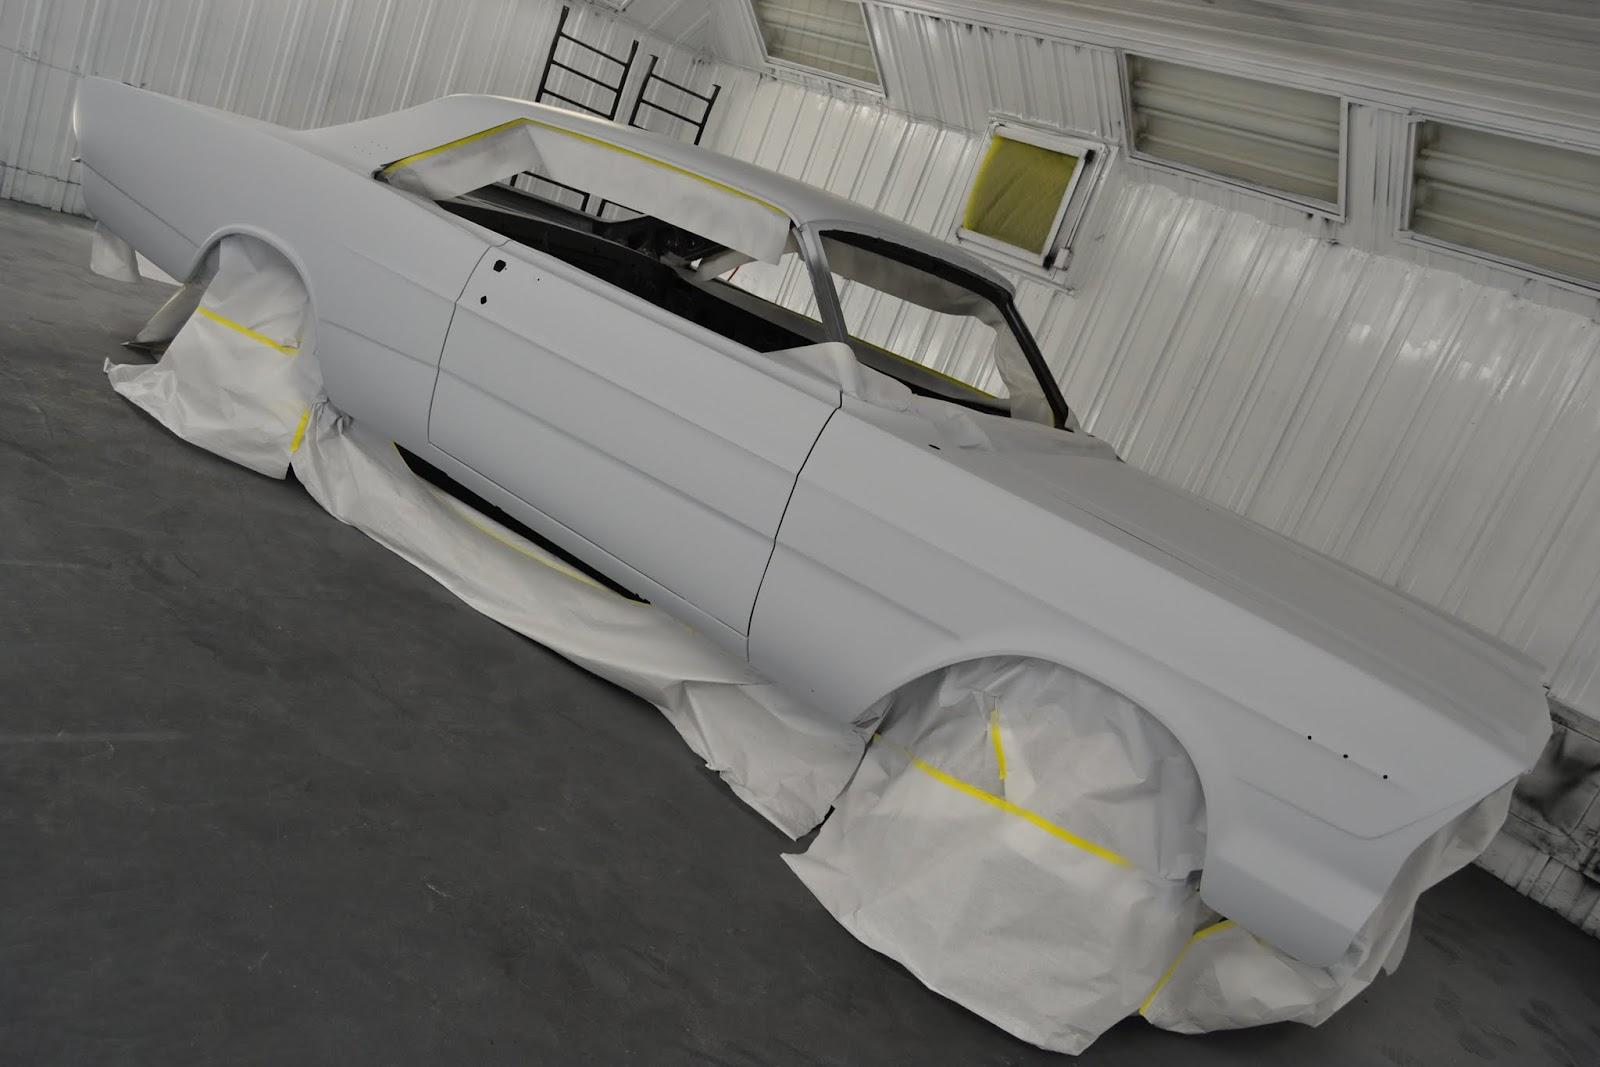 1966_Ford_7L_GT_10-13-15_0486.JPG